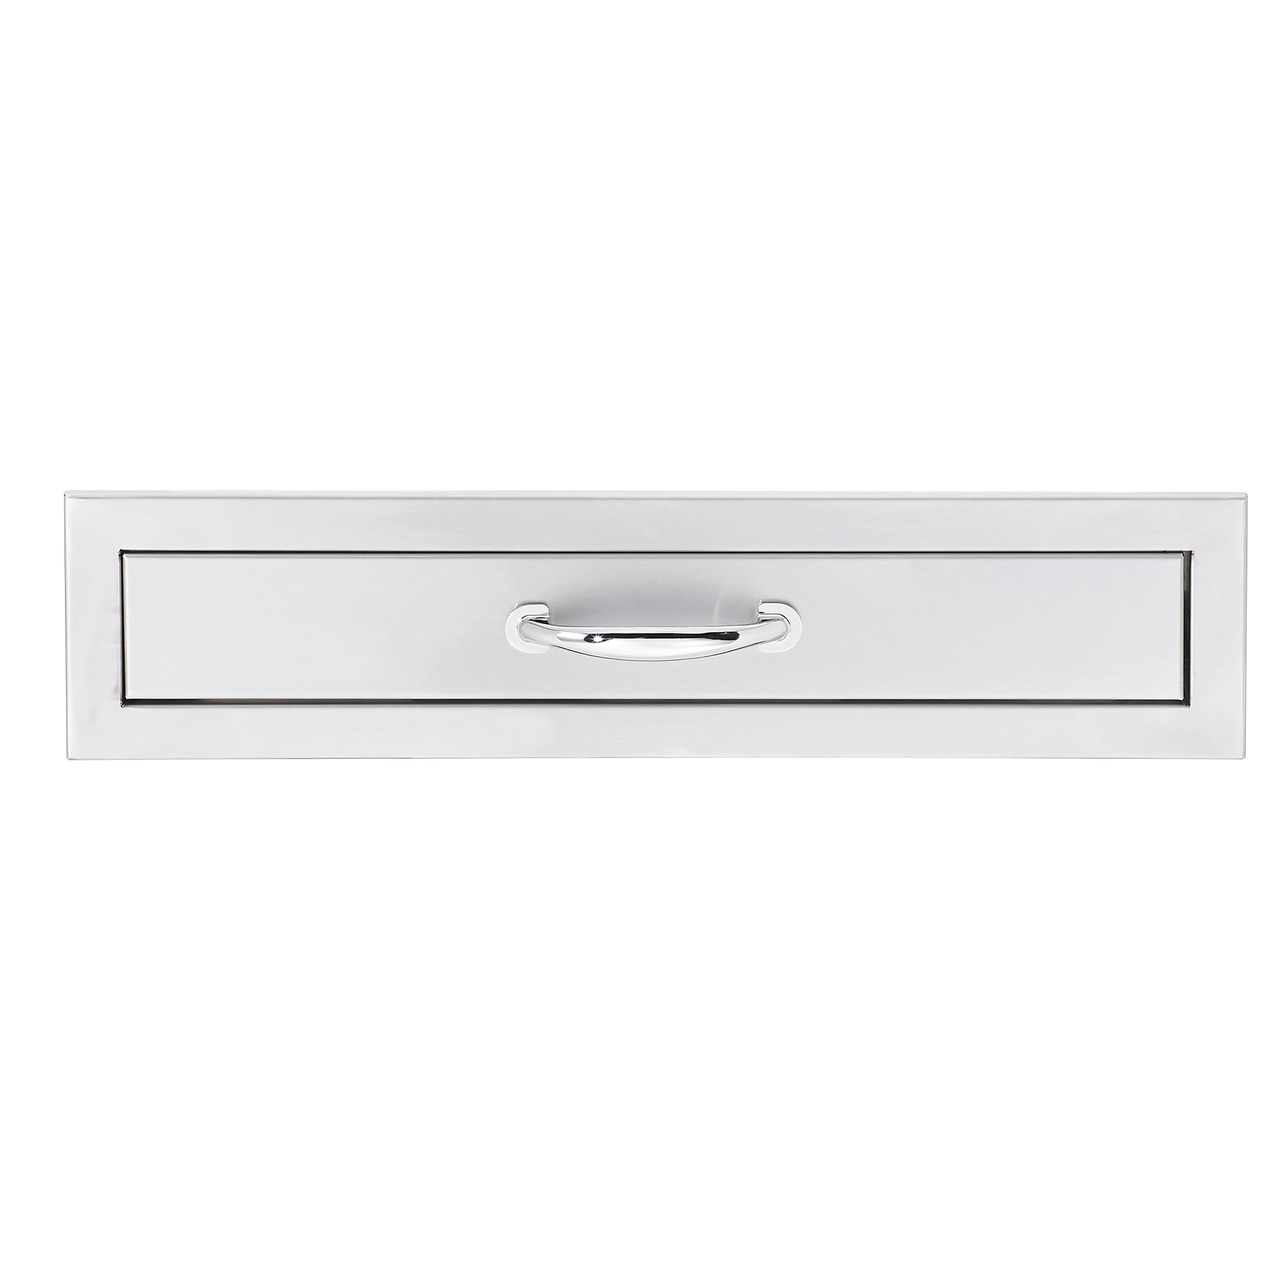 Summerset Utility Drawer - Storage Drawers - SSUD